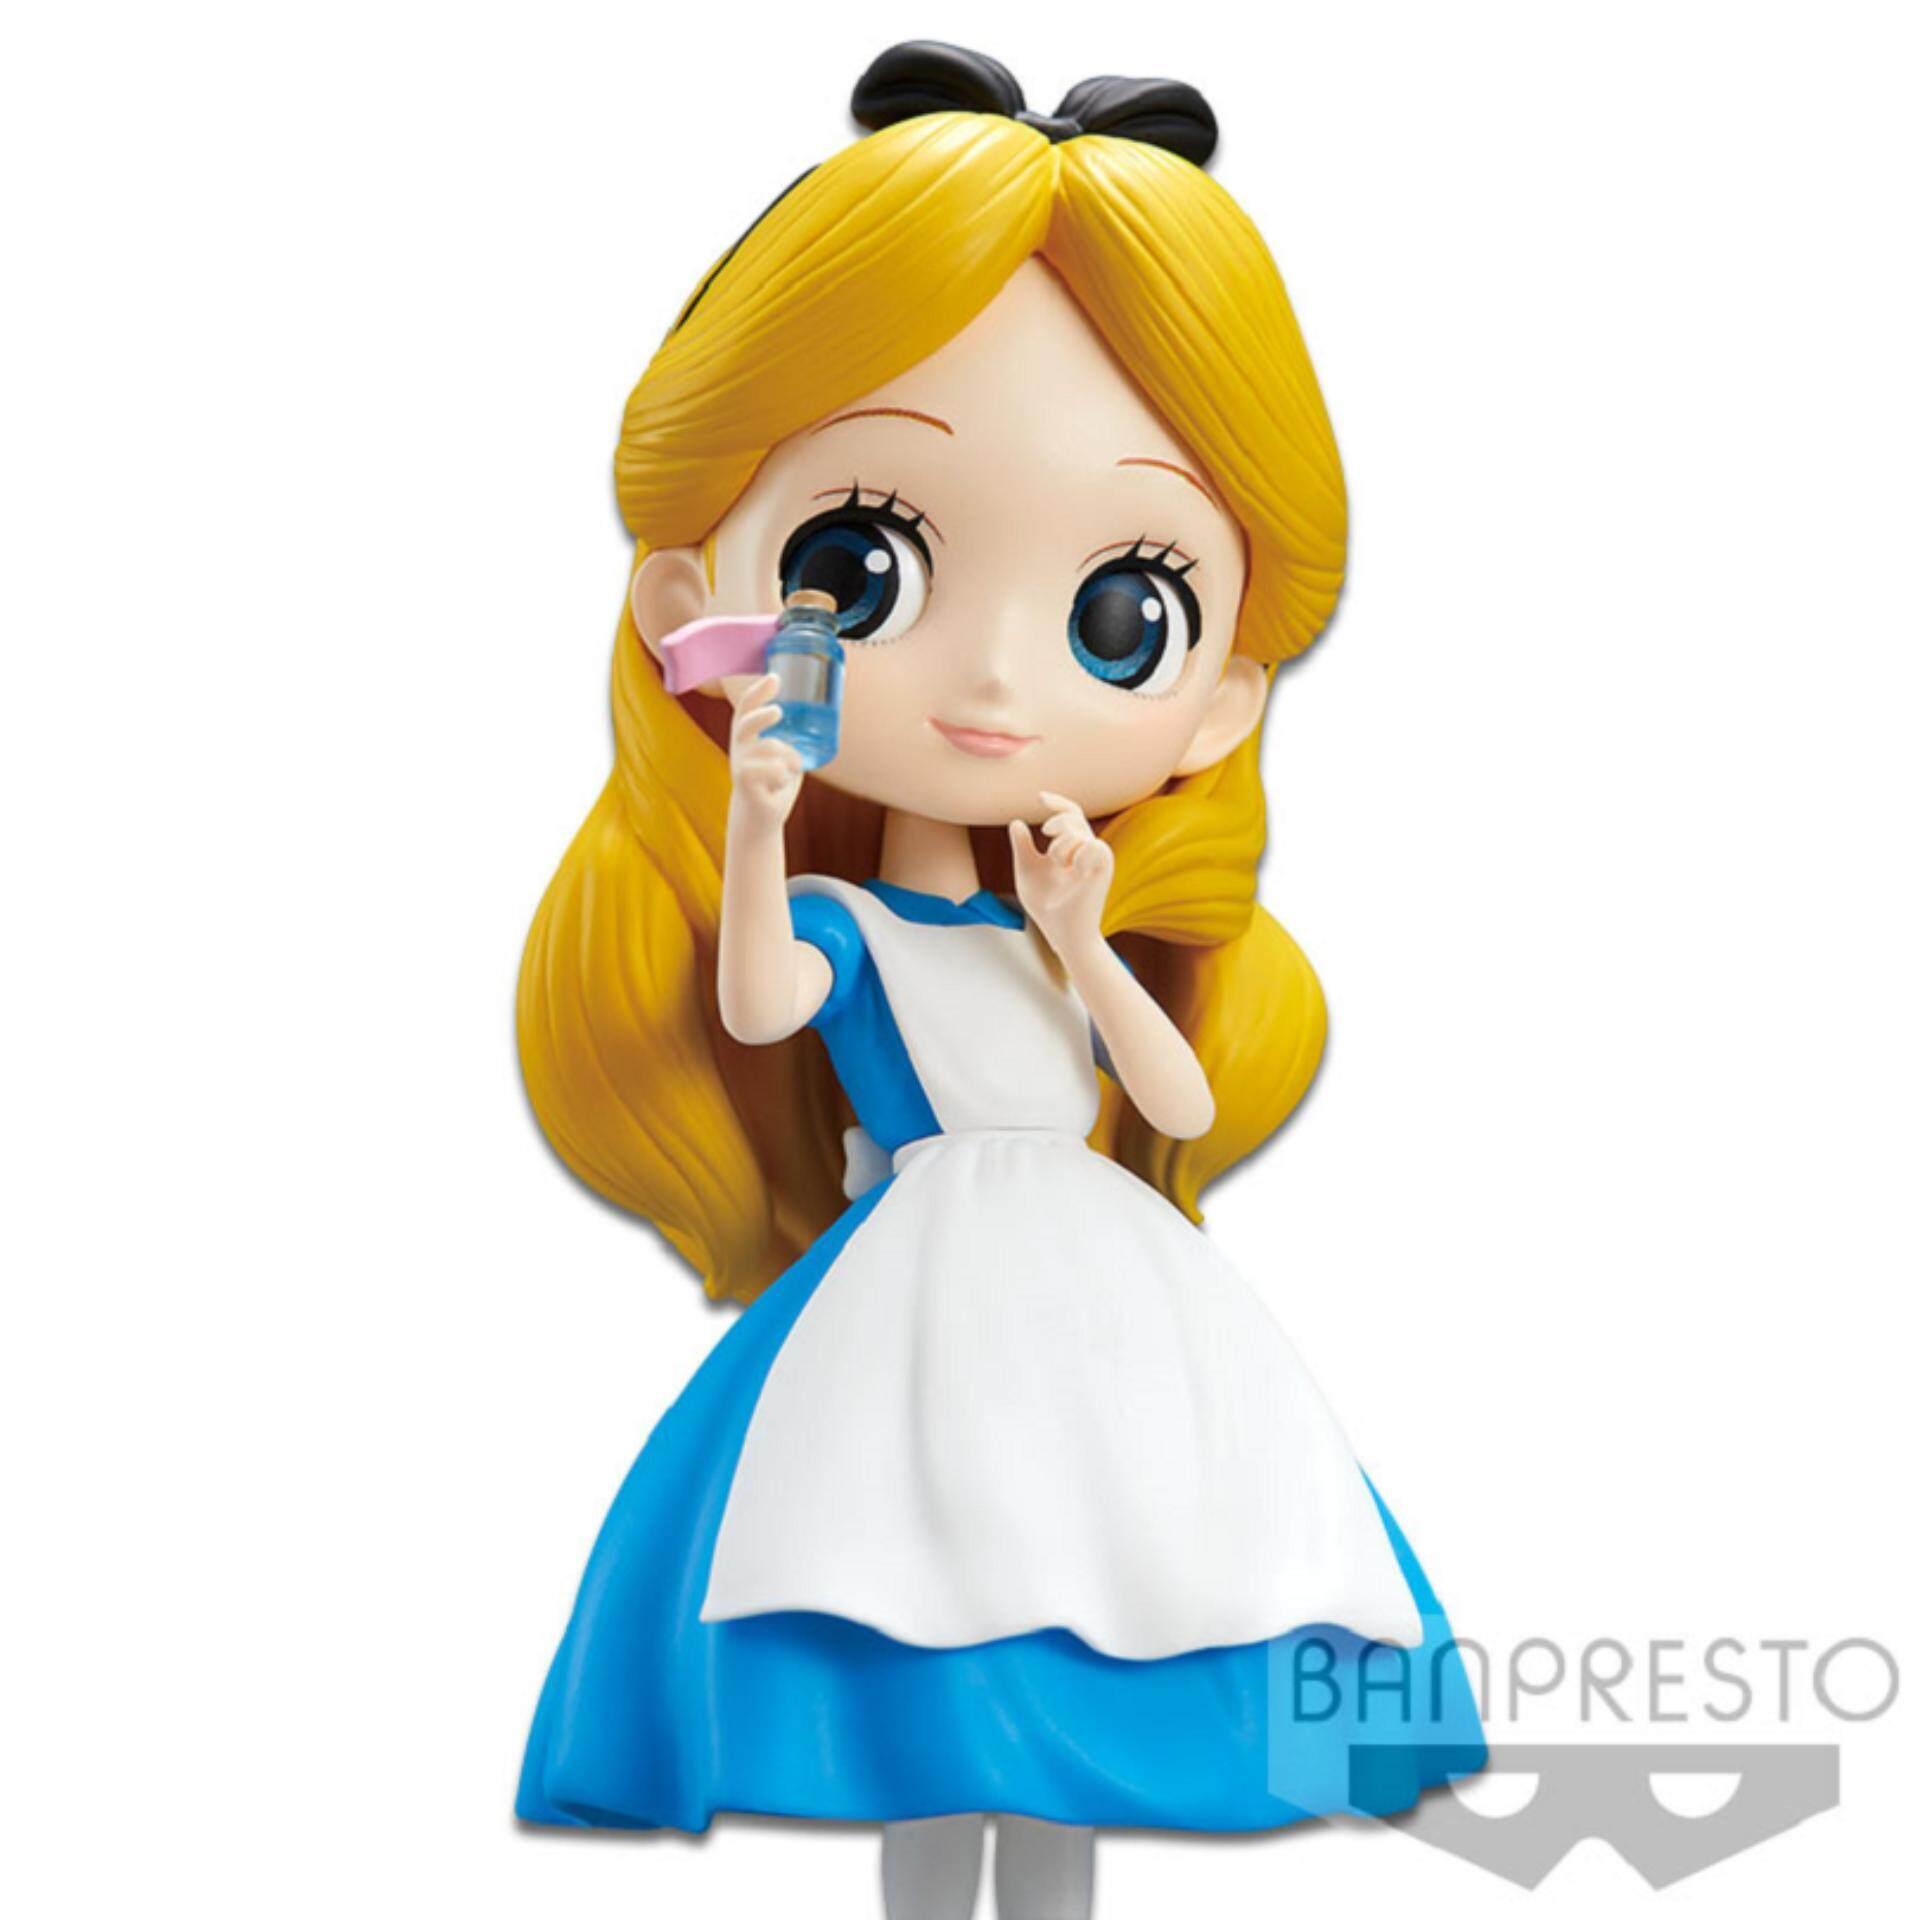 Banpresto Q Posket Disney Princess Figure Normal Version - Alice Thinking Time